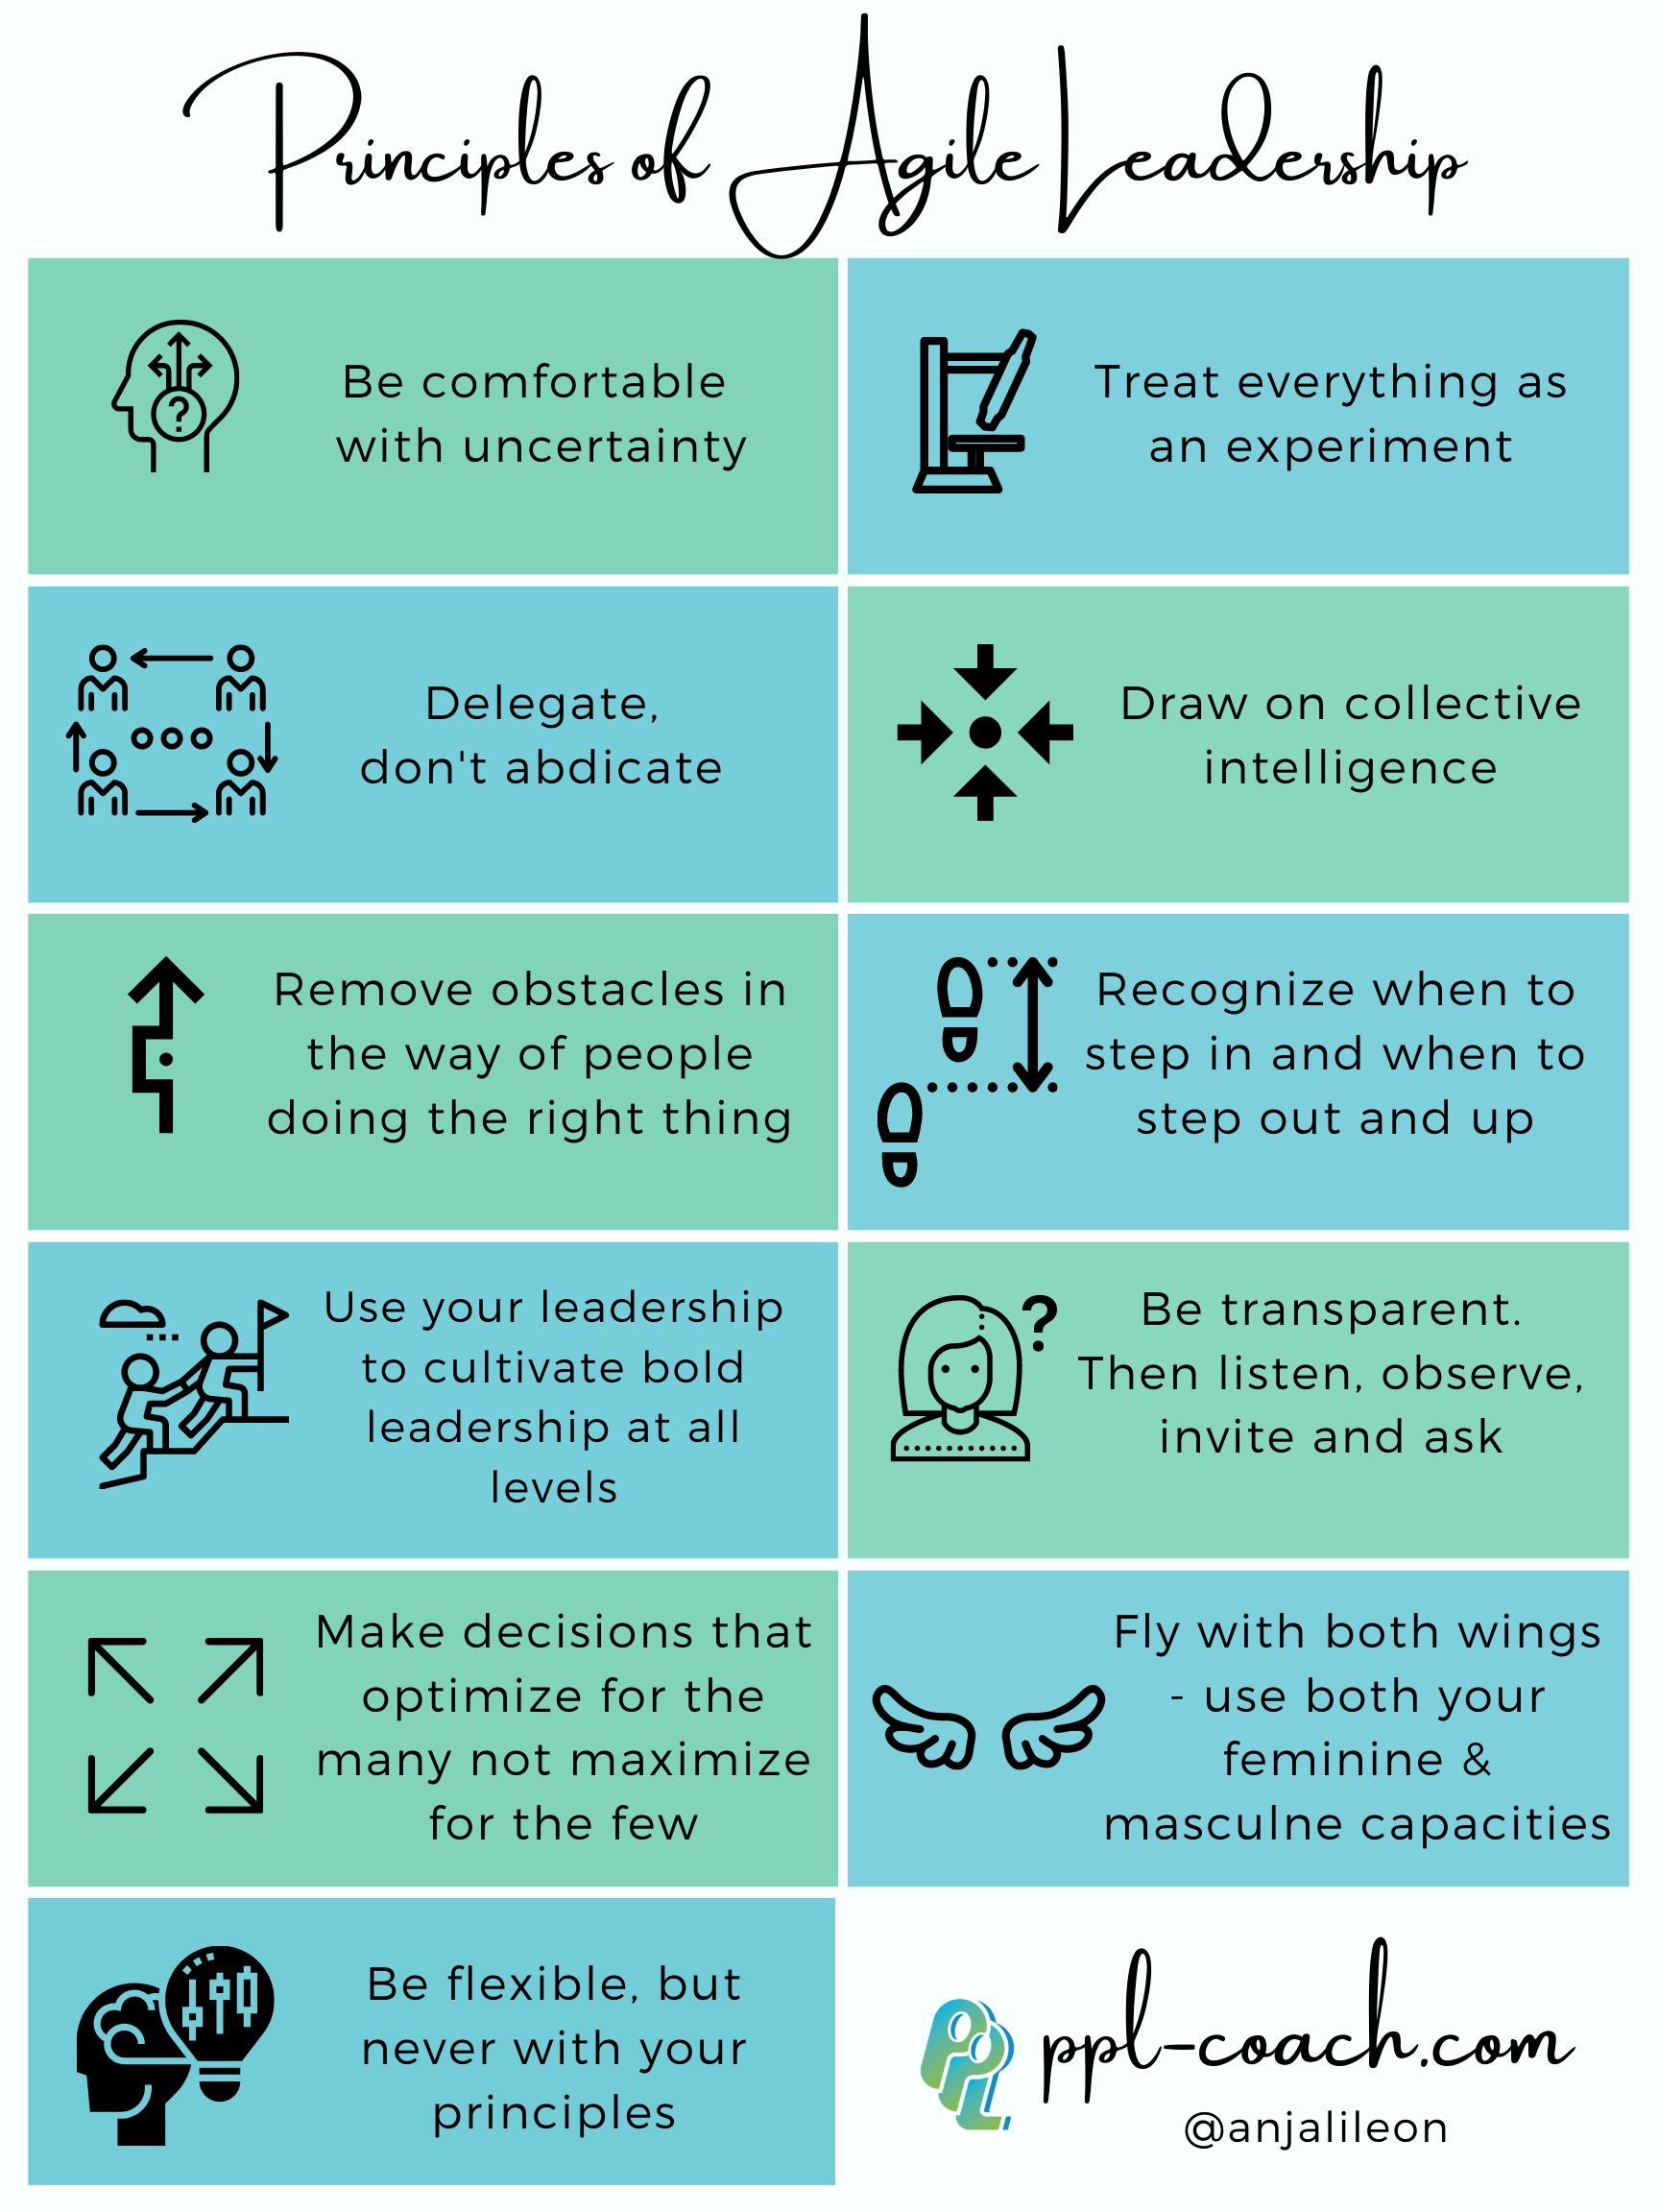 PrinciplesofAgileLeadership